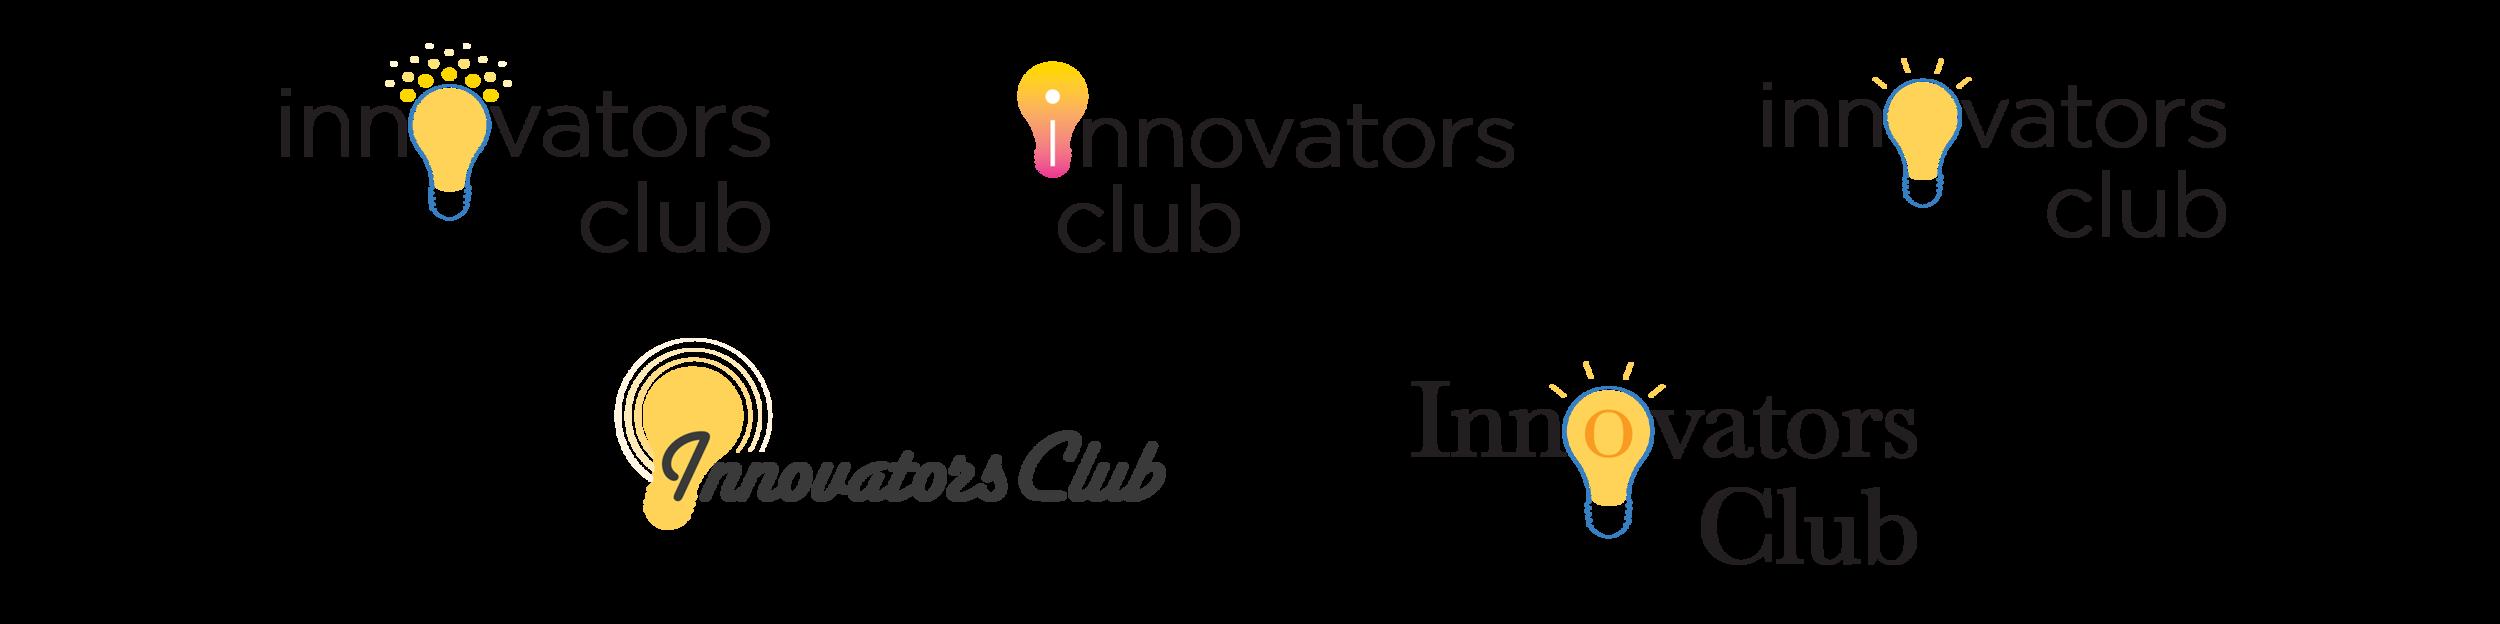 Innovators_club_logos_2.png